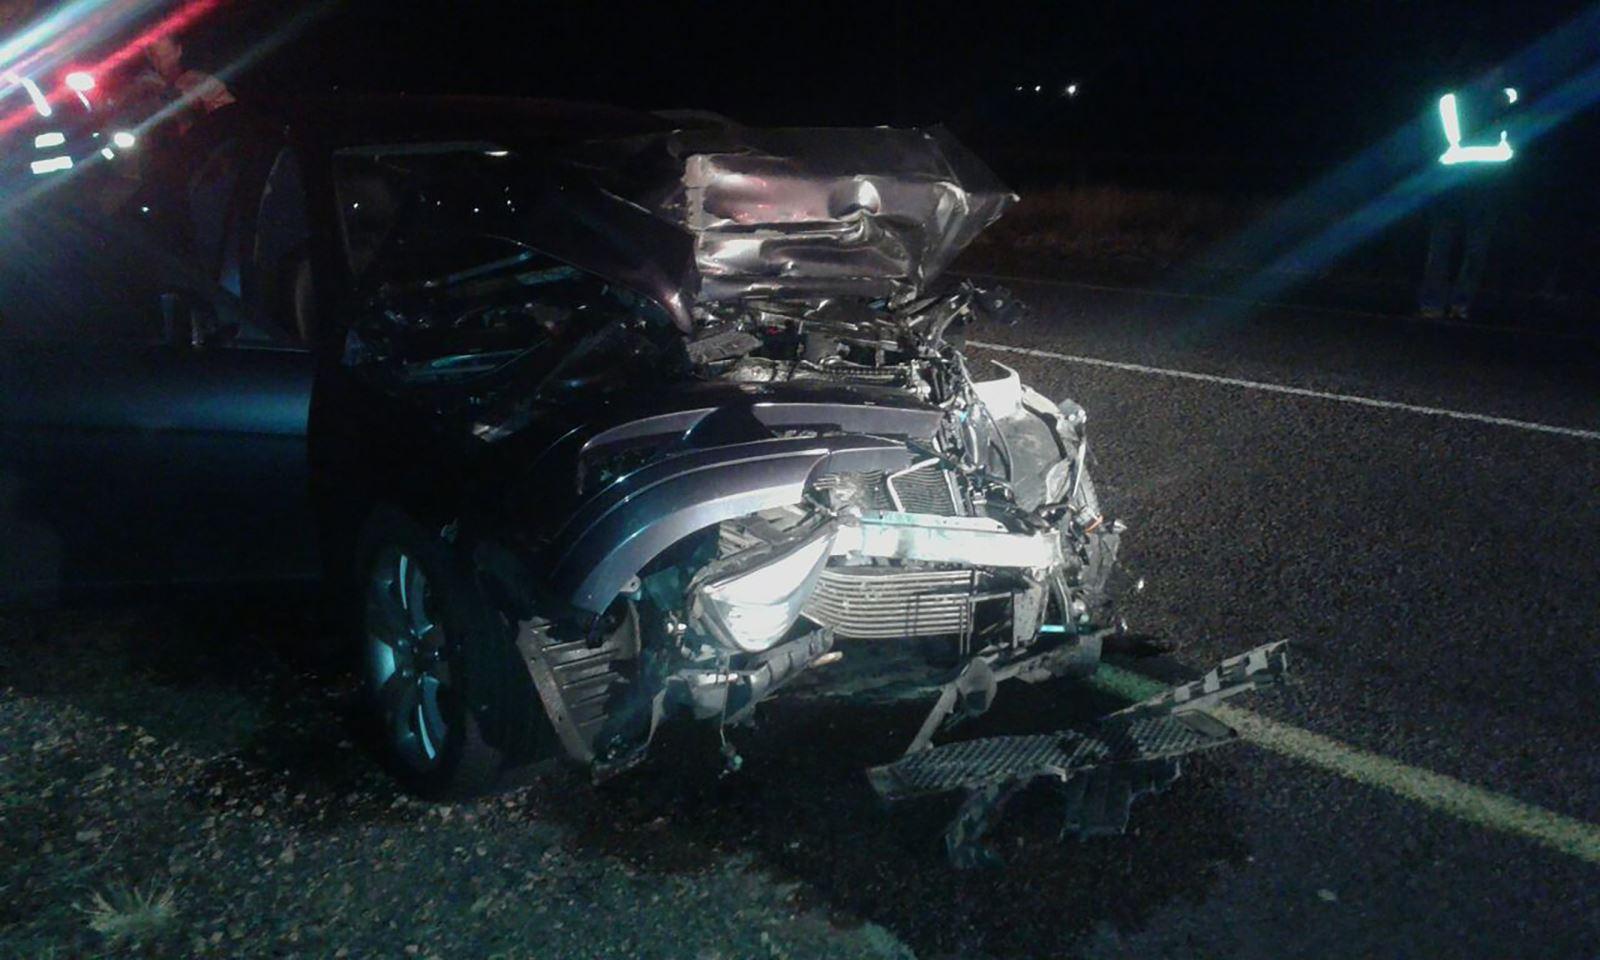 Two killed, one injured in N14 Kathu collision - Kimberley